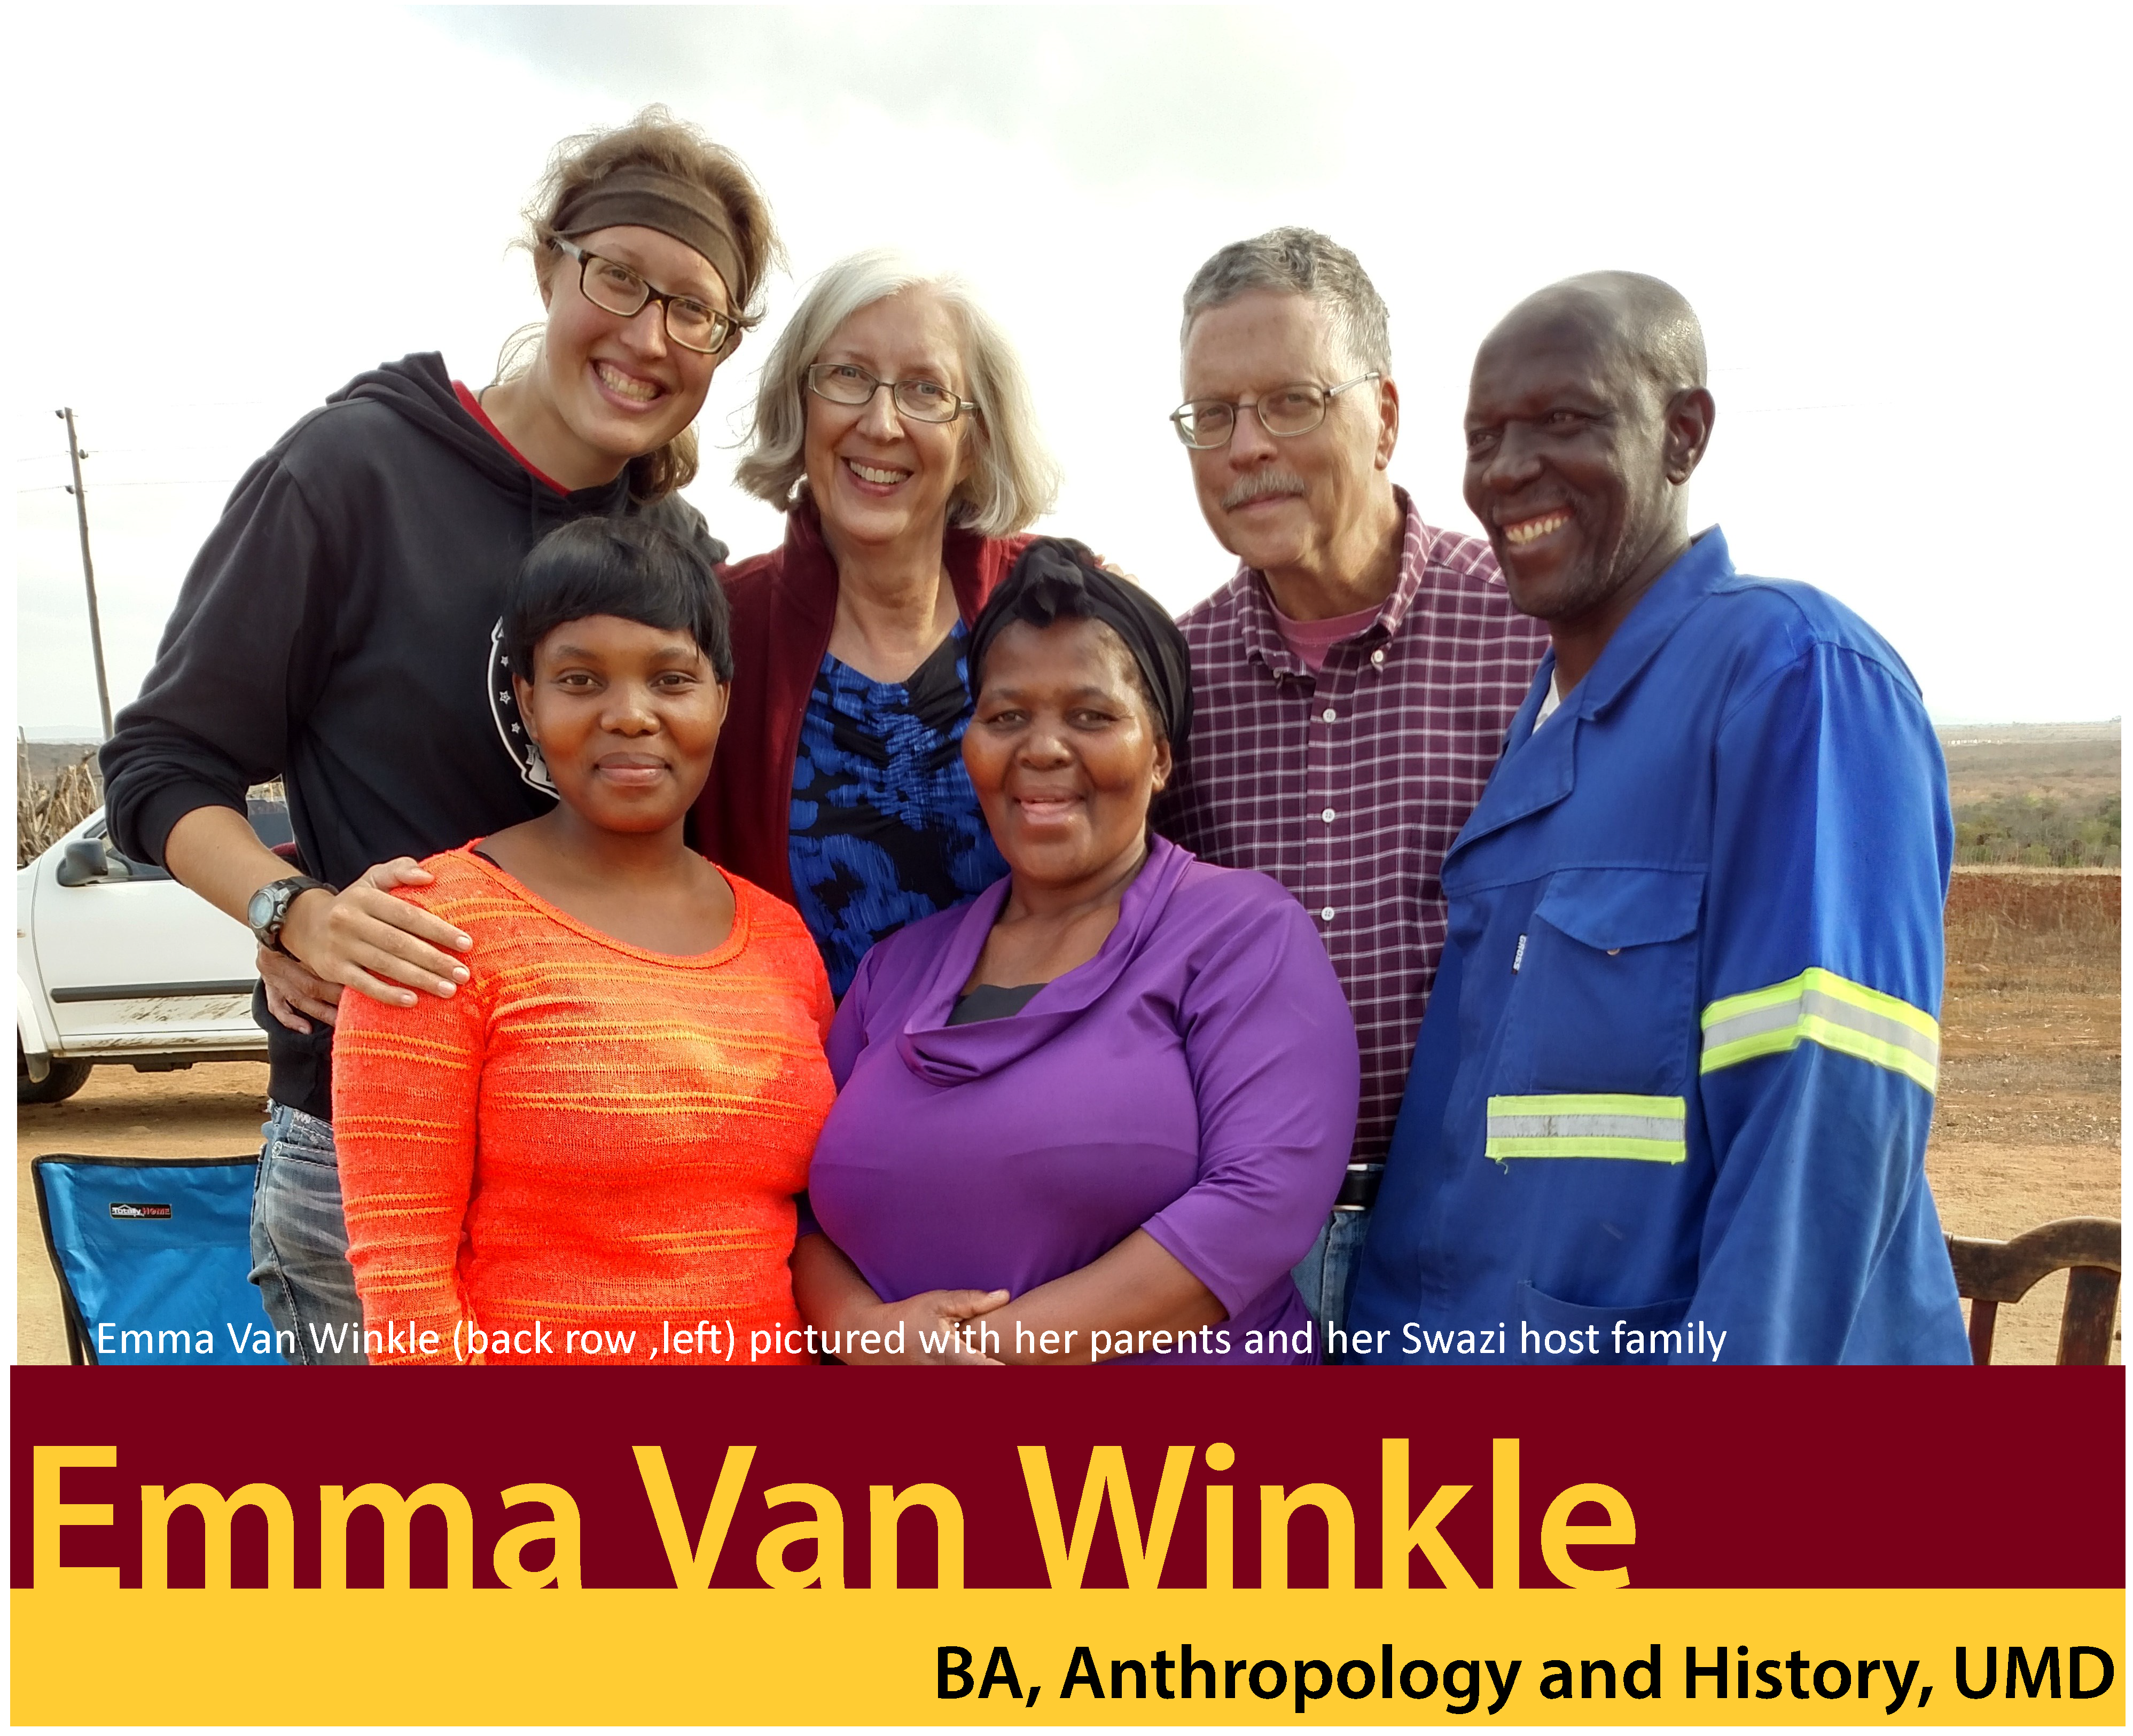 Alumni Photo: Emma Van Winkle